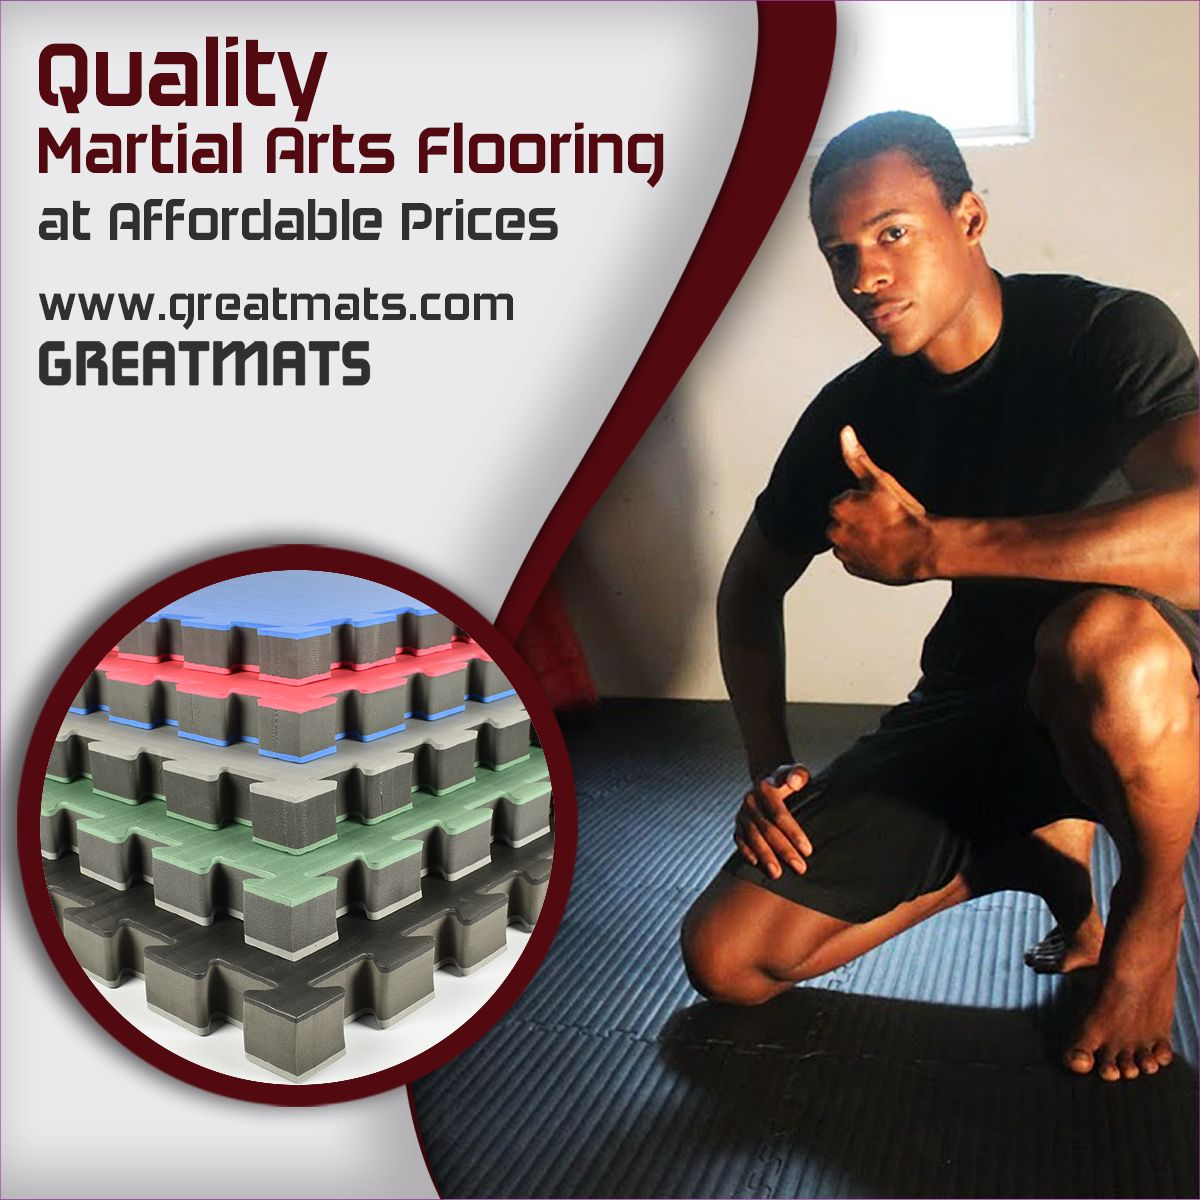 Professional dojo studio owners seeking flooring options